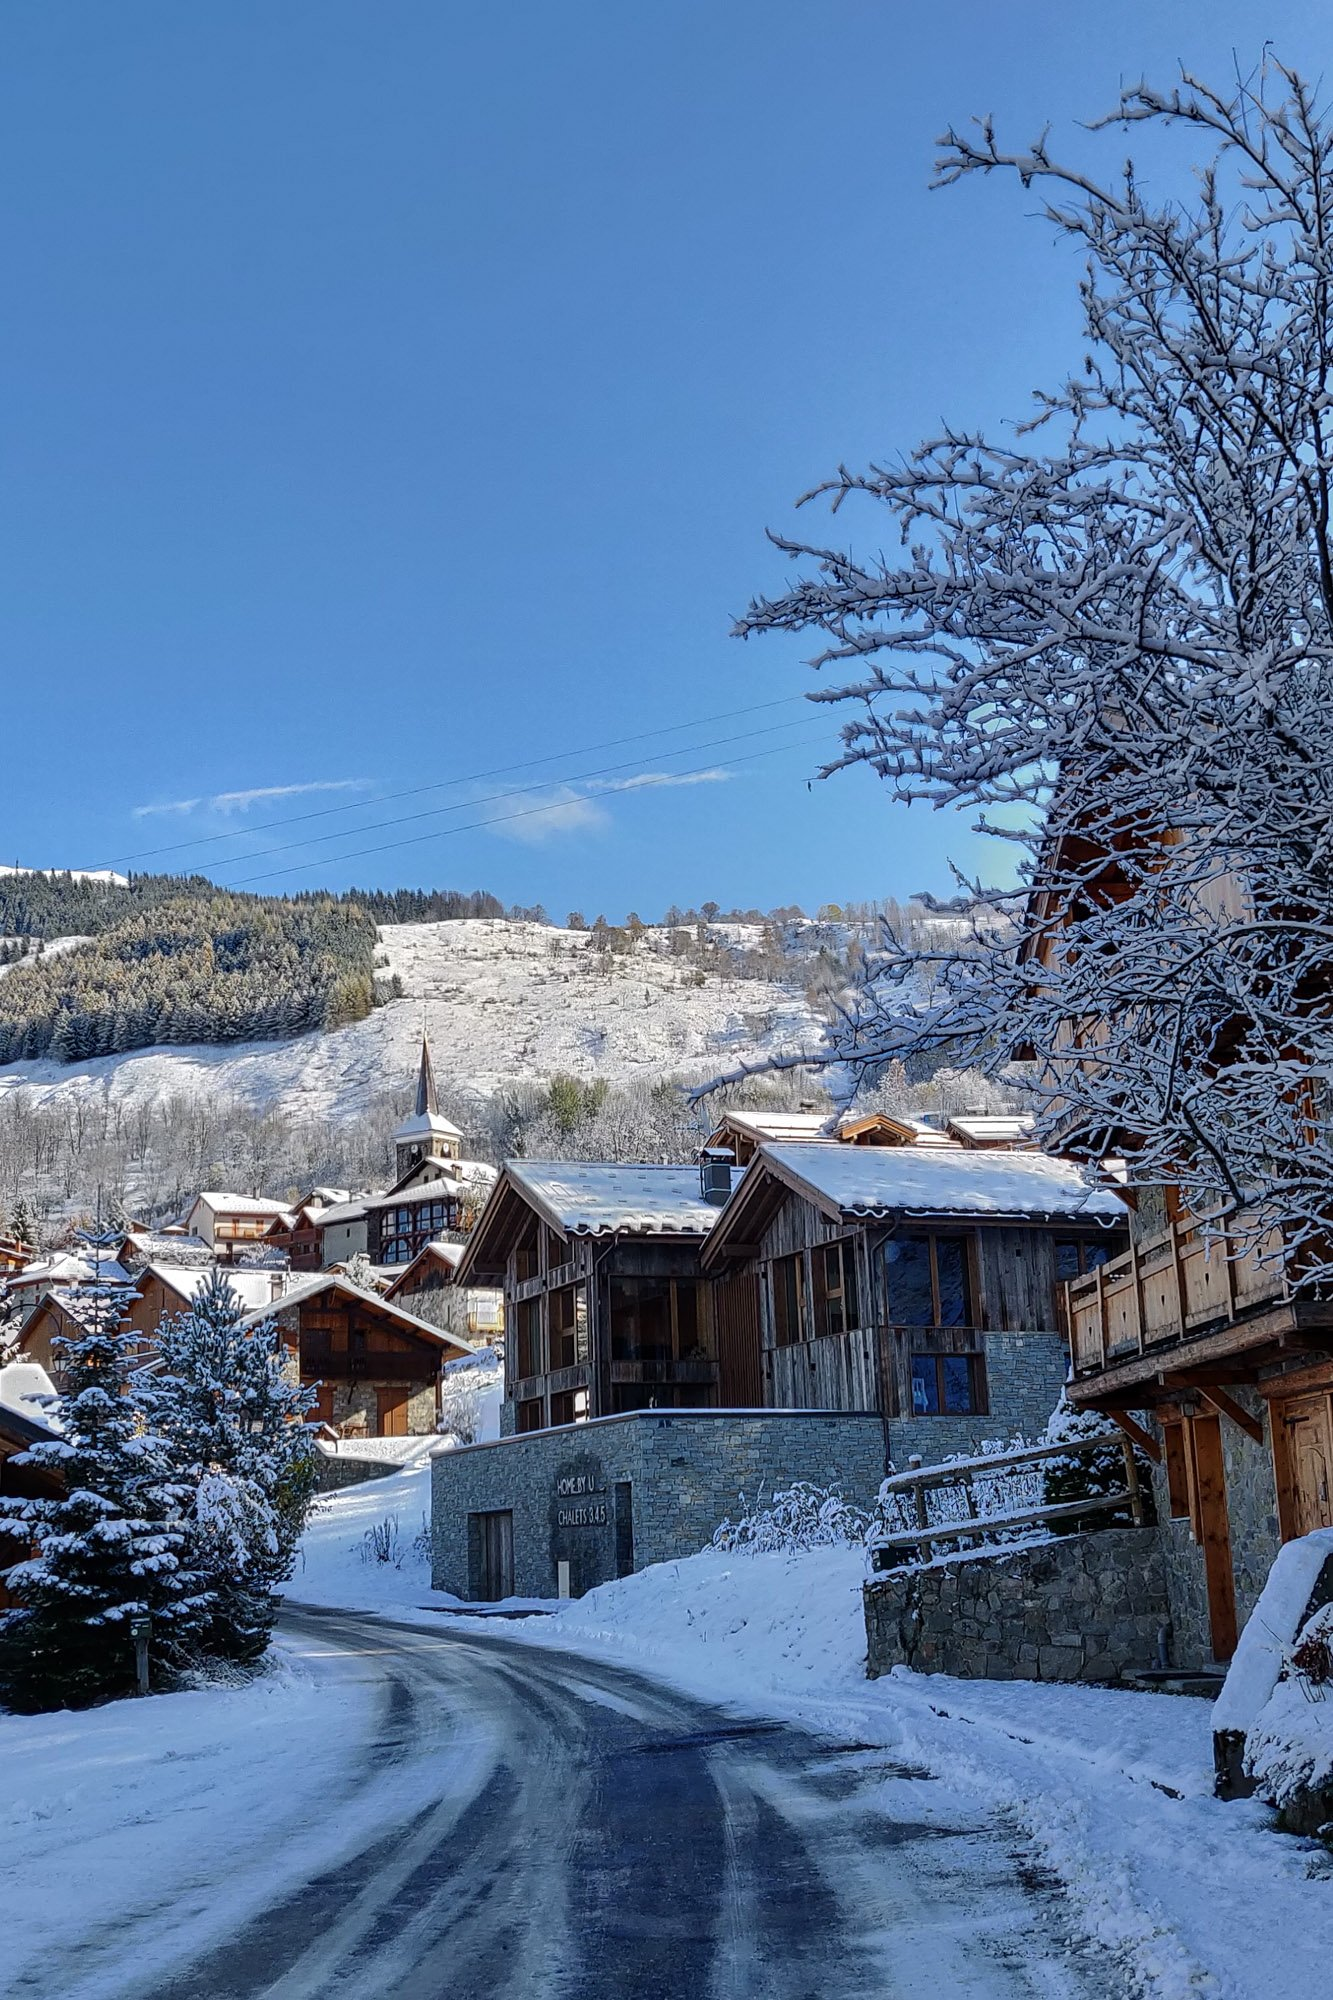 St Martin de Belleville - A traditional ski village